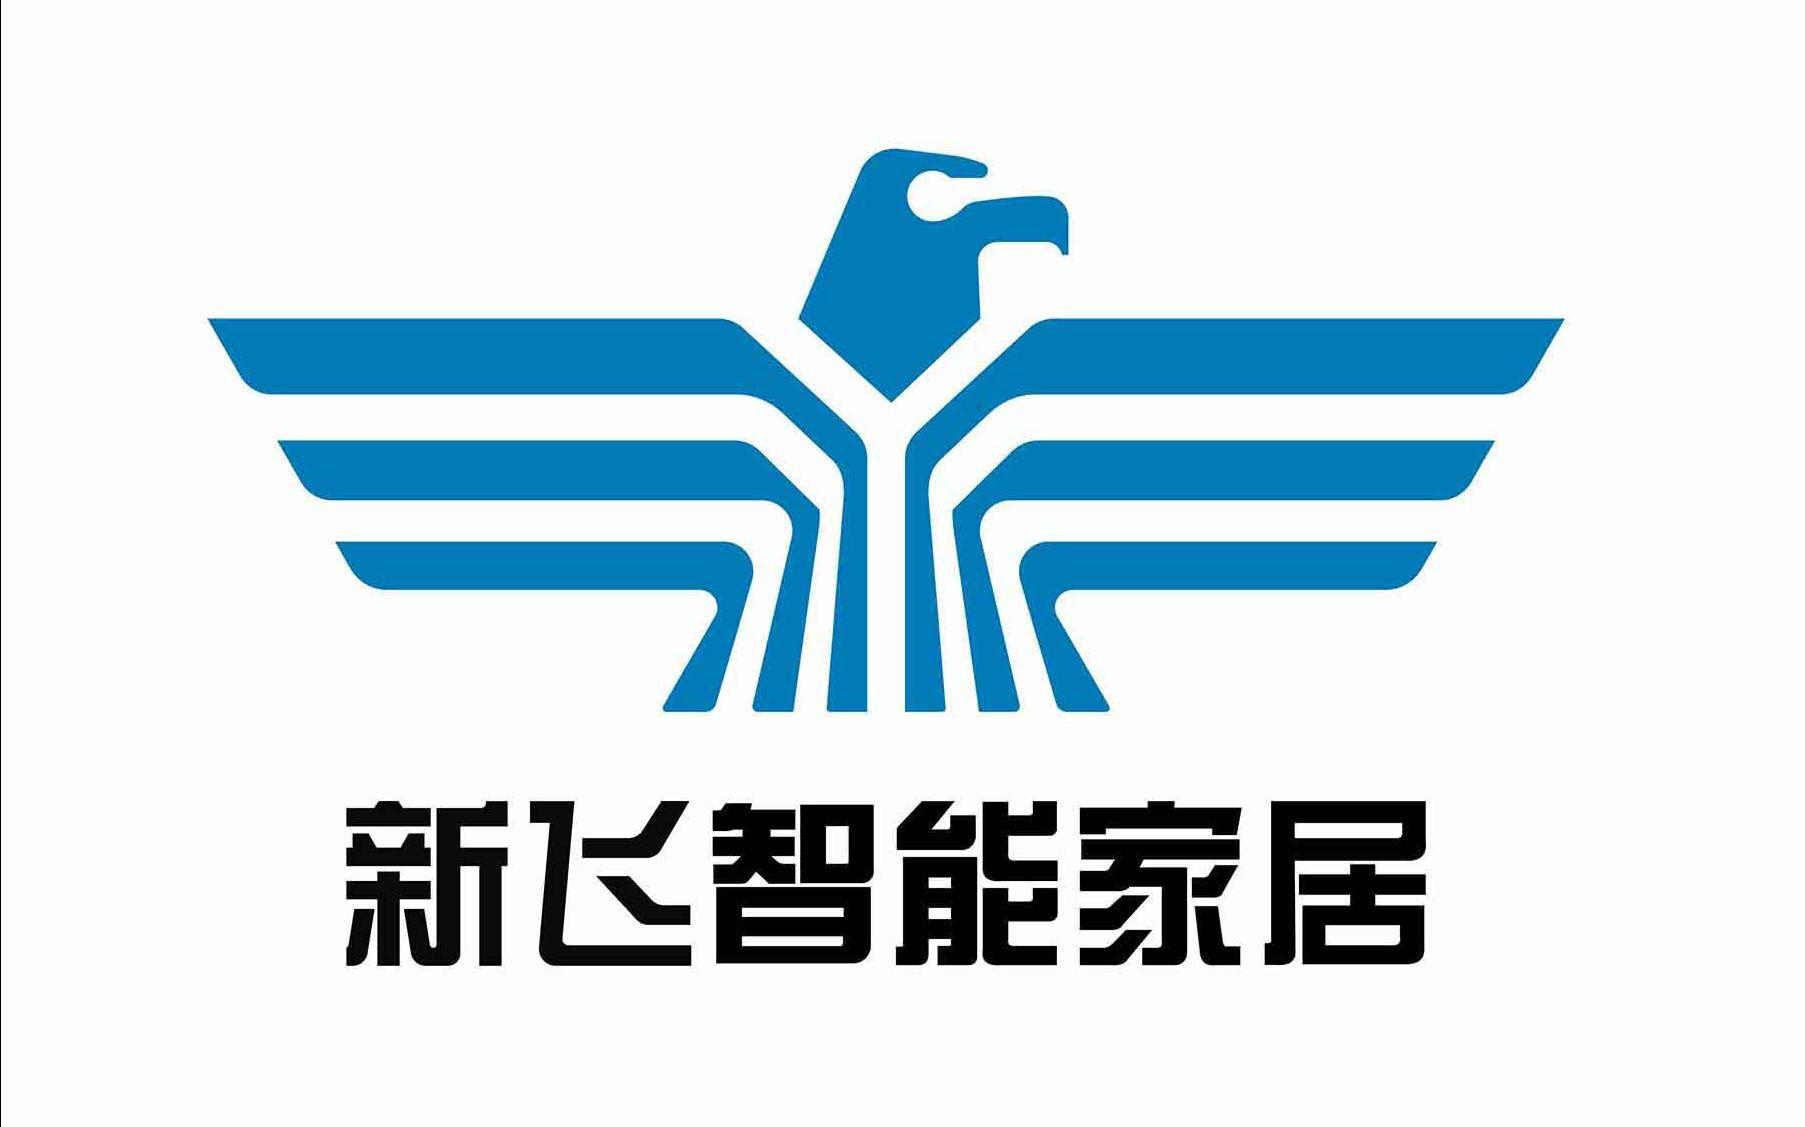 logo logo 标志 设计 图标 1805_1127